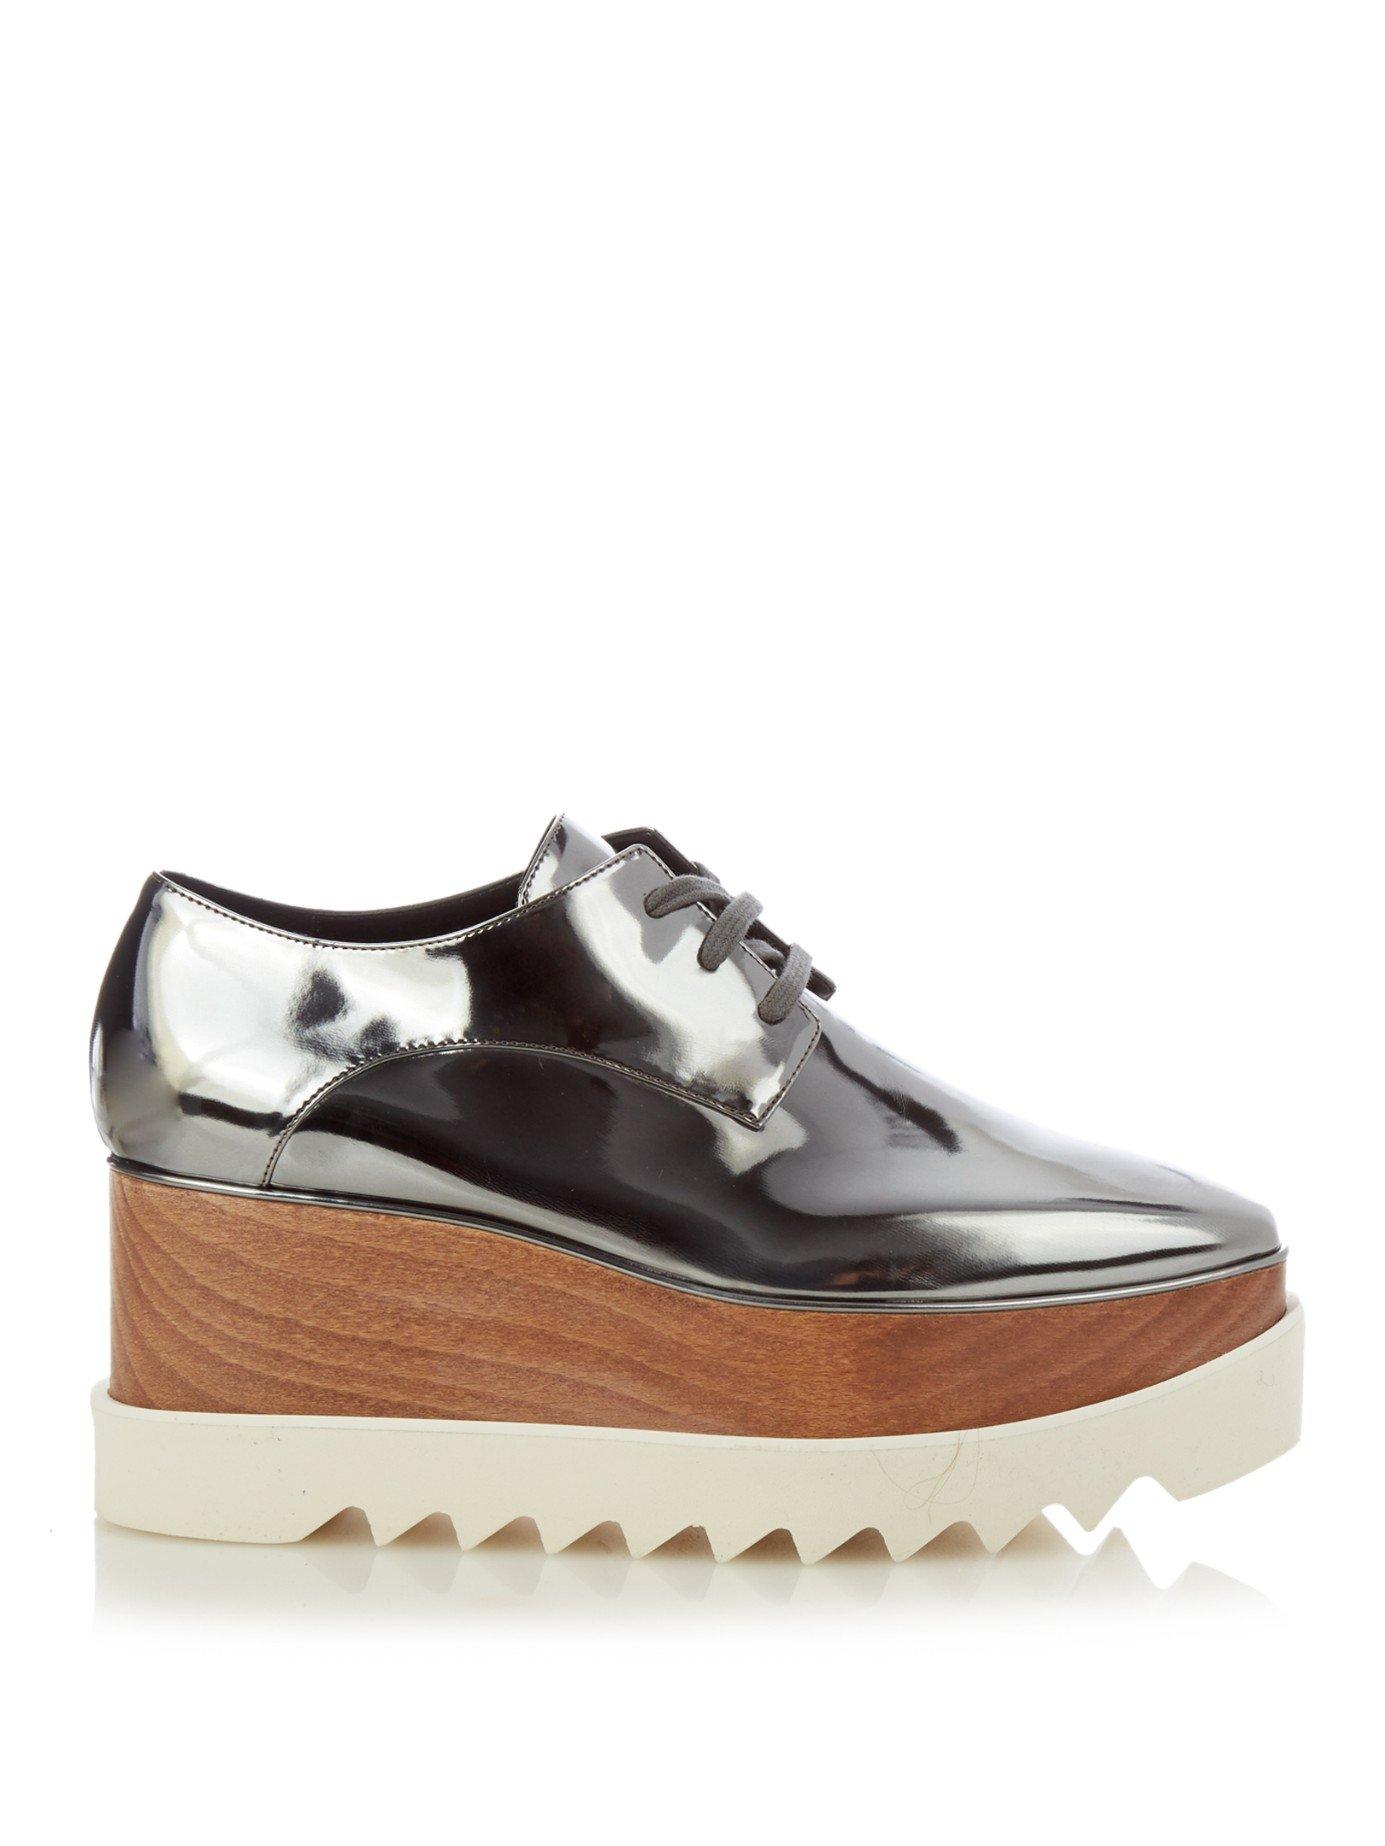 d1eb19448284 Stella Mccartney Usa Shoes. Lyst - Stella McCartney Elyse Faux-Leather  Platform ...